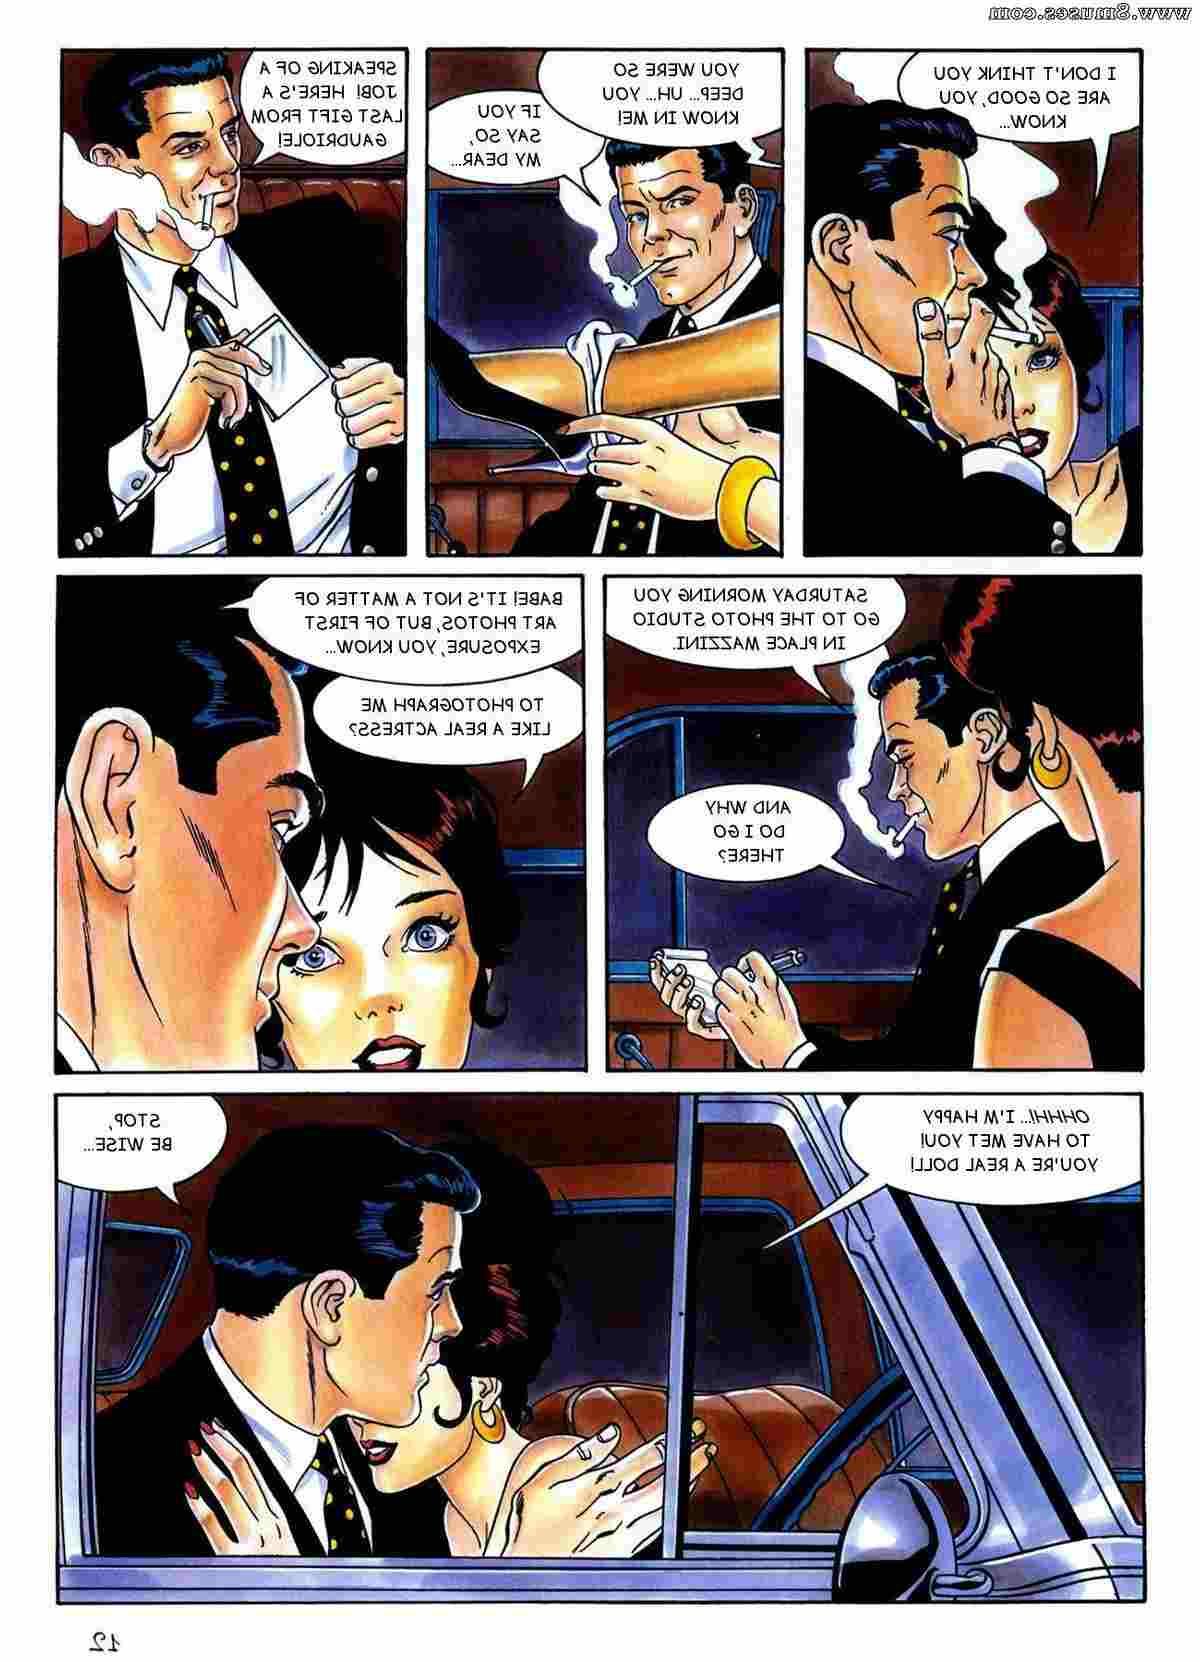 Stramaglia-Morale-Comics/Anna-Perverted-Innocence Anna_Perverted_Innocence__8muses_-_Sex_and_Porn_Comics_15.jpg